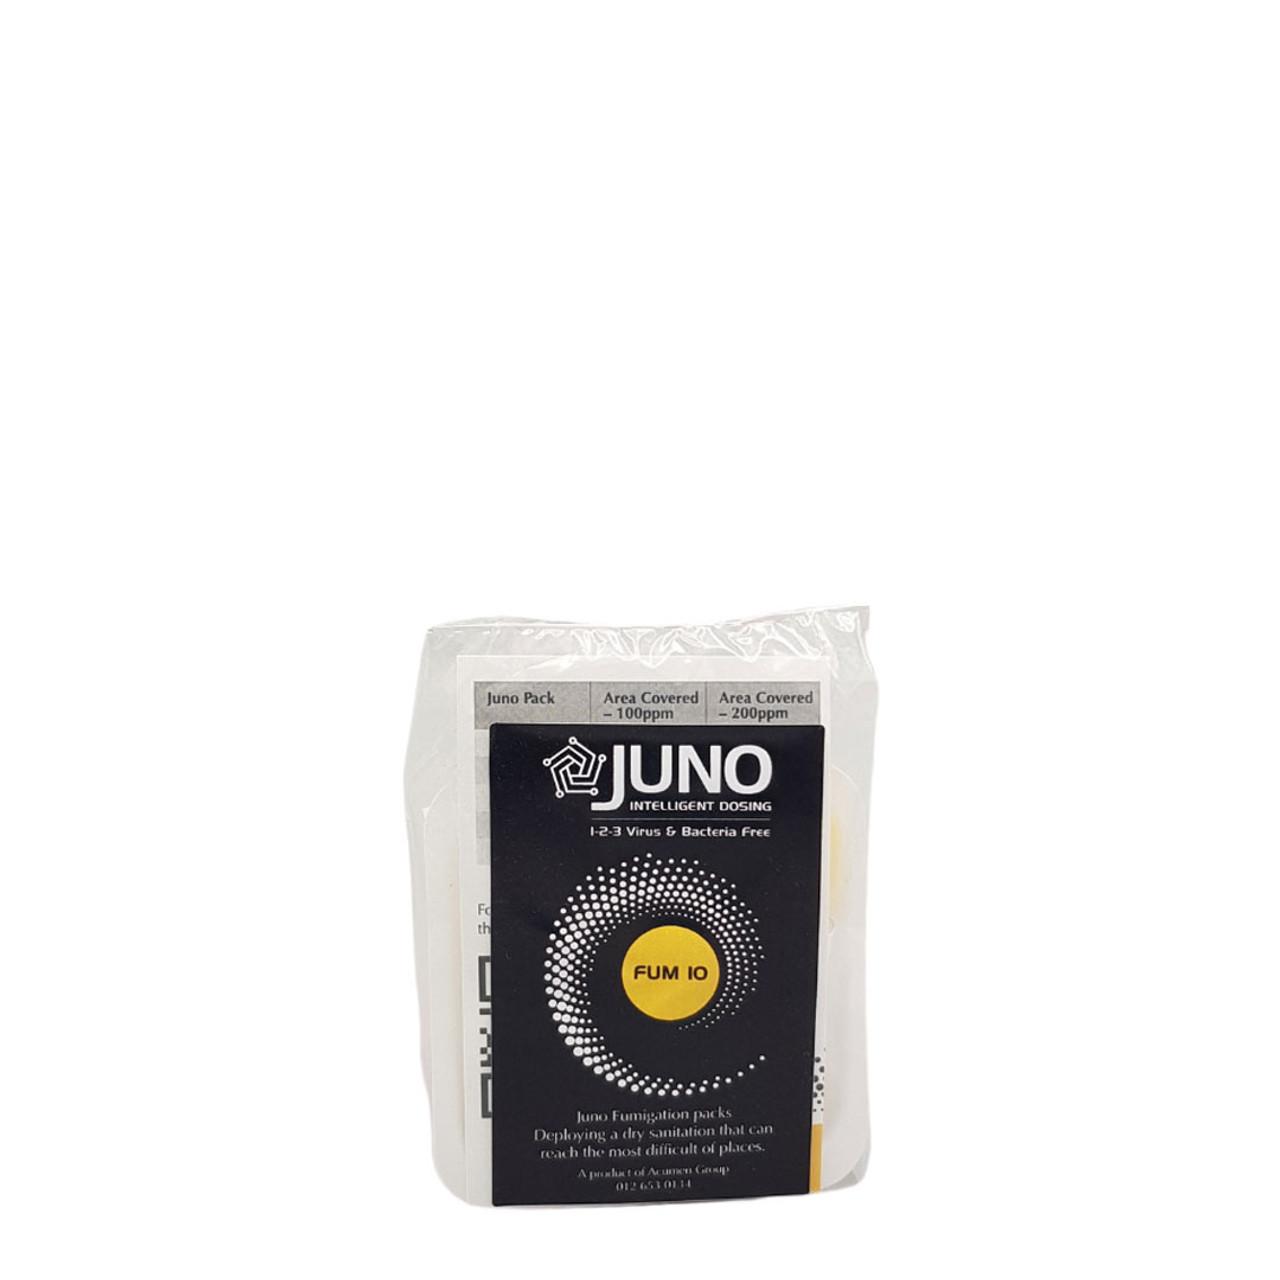 Juno FUM10 - Mask And PPE Sanitation